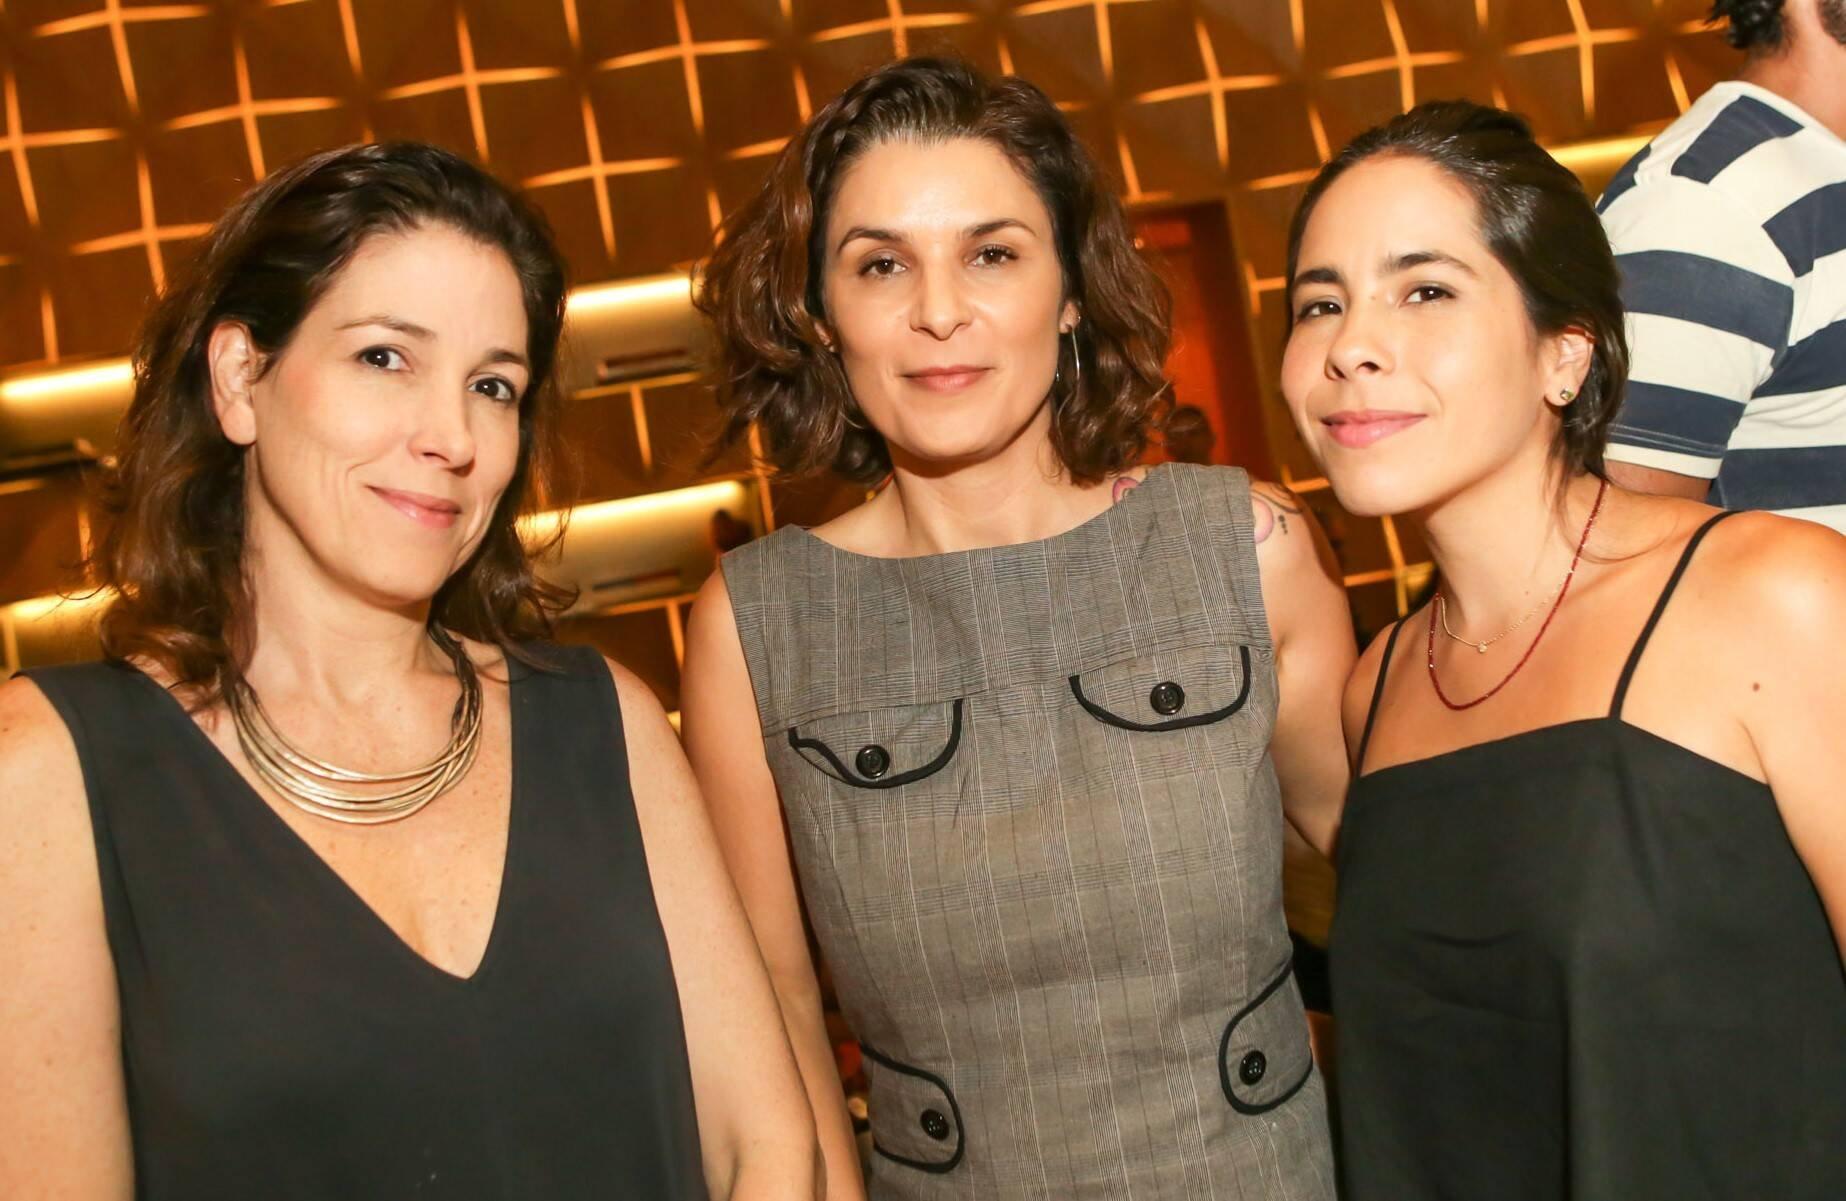 Leticia Provedel, Jeane Terra e Gabriela Rocha  /Foto: Gianne Carvalho